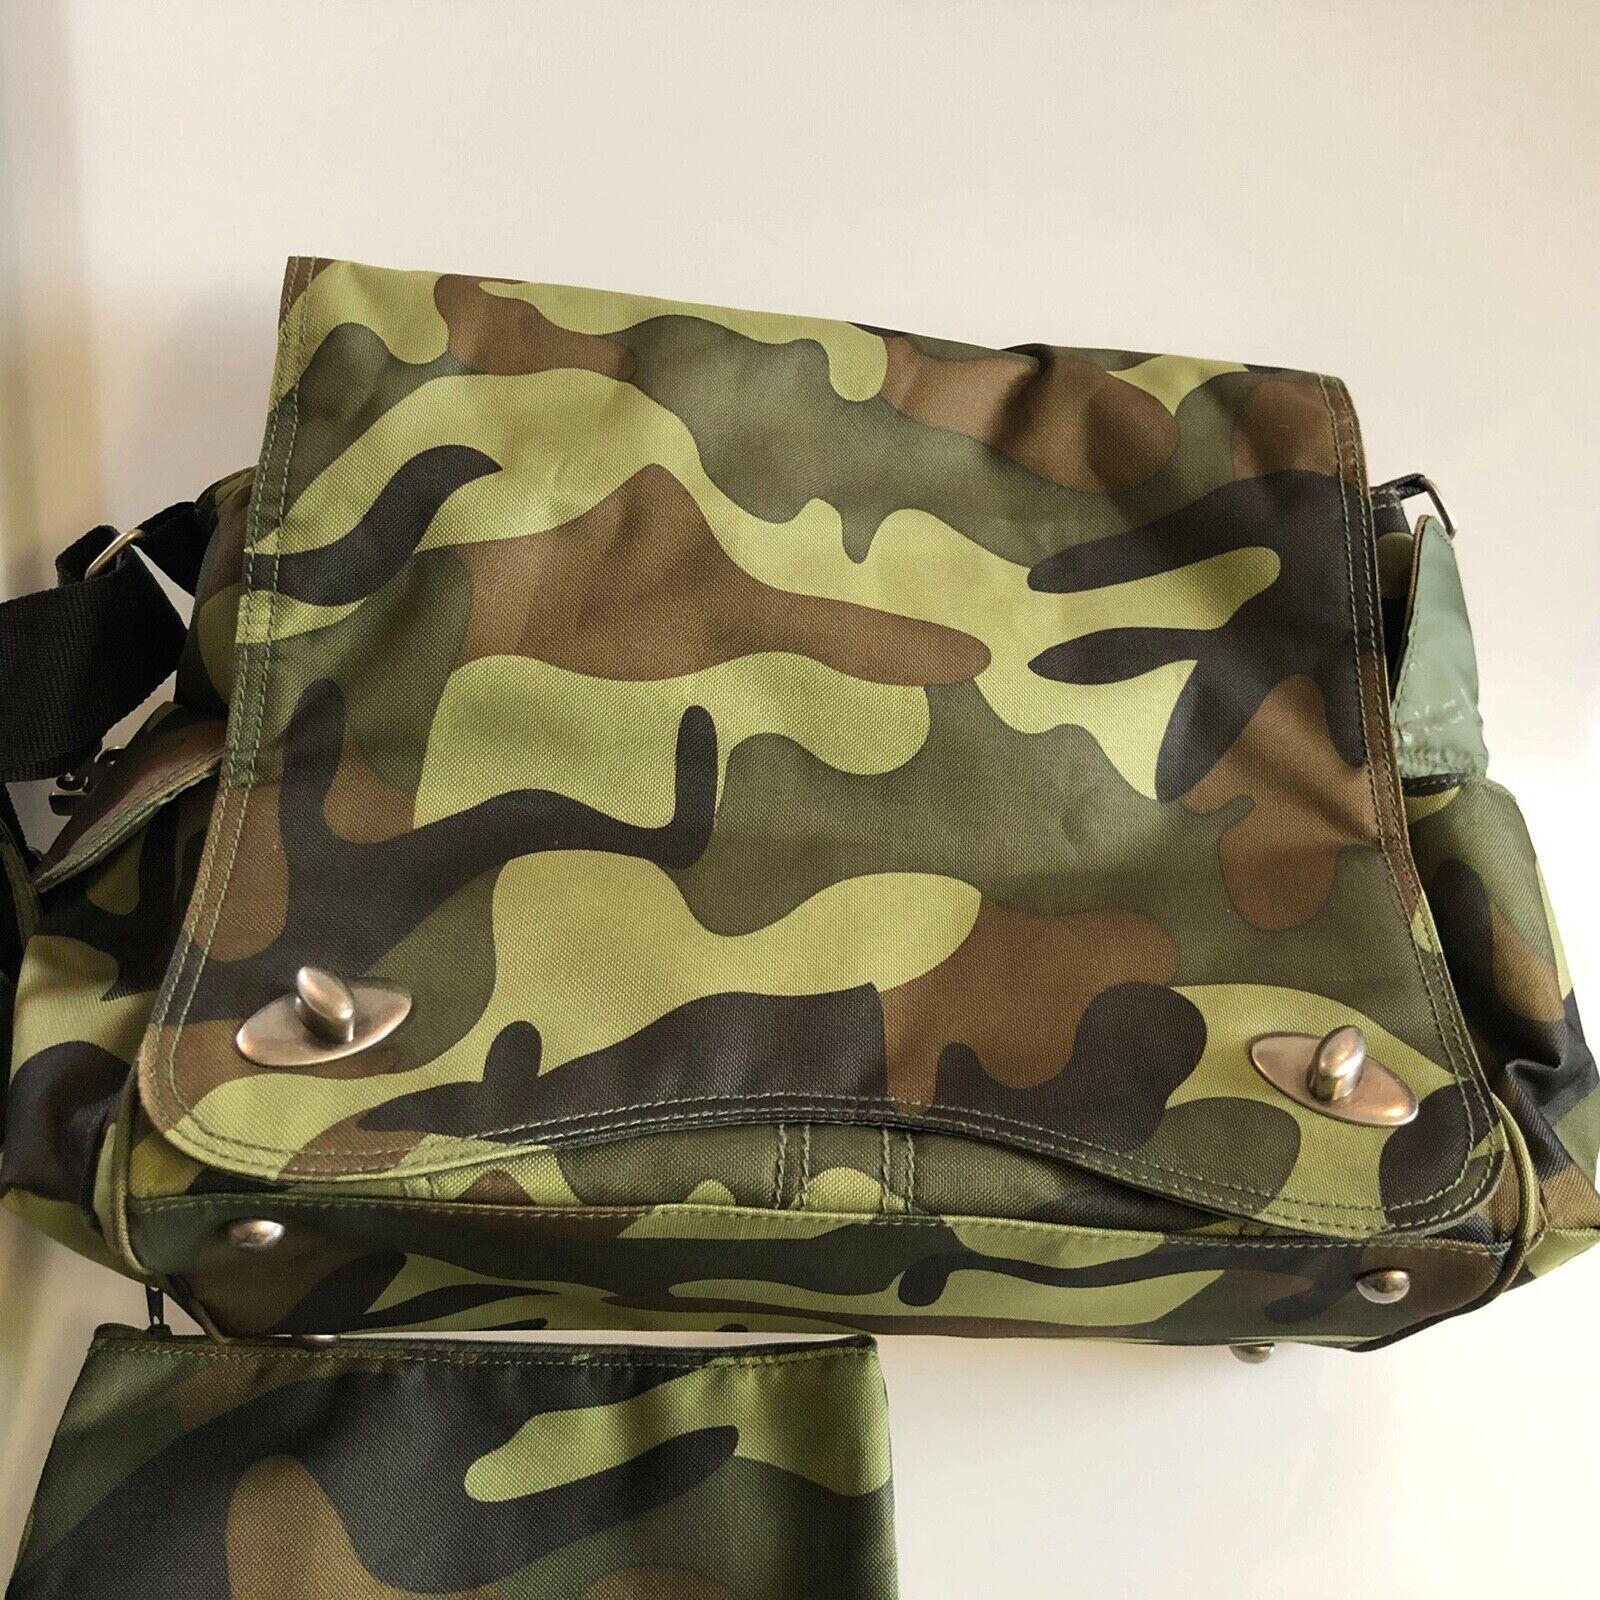 Kalencom Sam's Duck Duck Goose Messenger Bag, Green